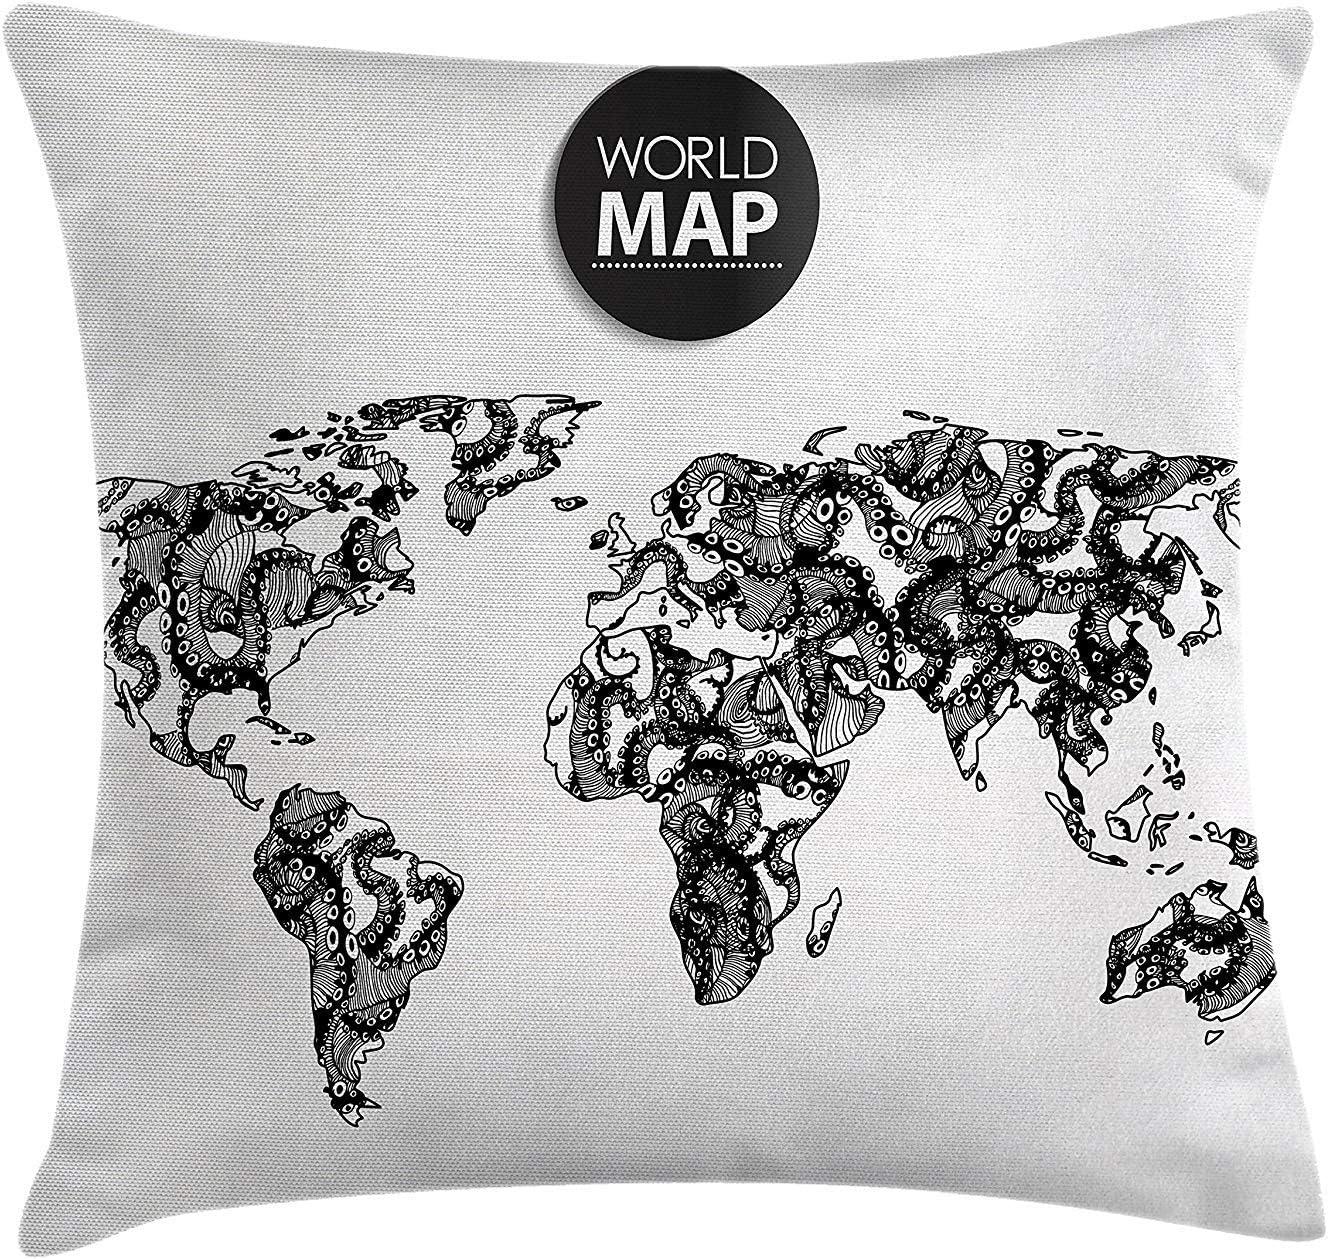 Wanderlust Throw Pillow Cushion Cover, Modern Elements of